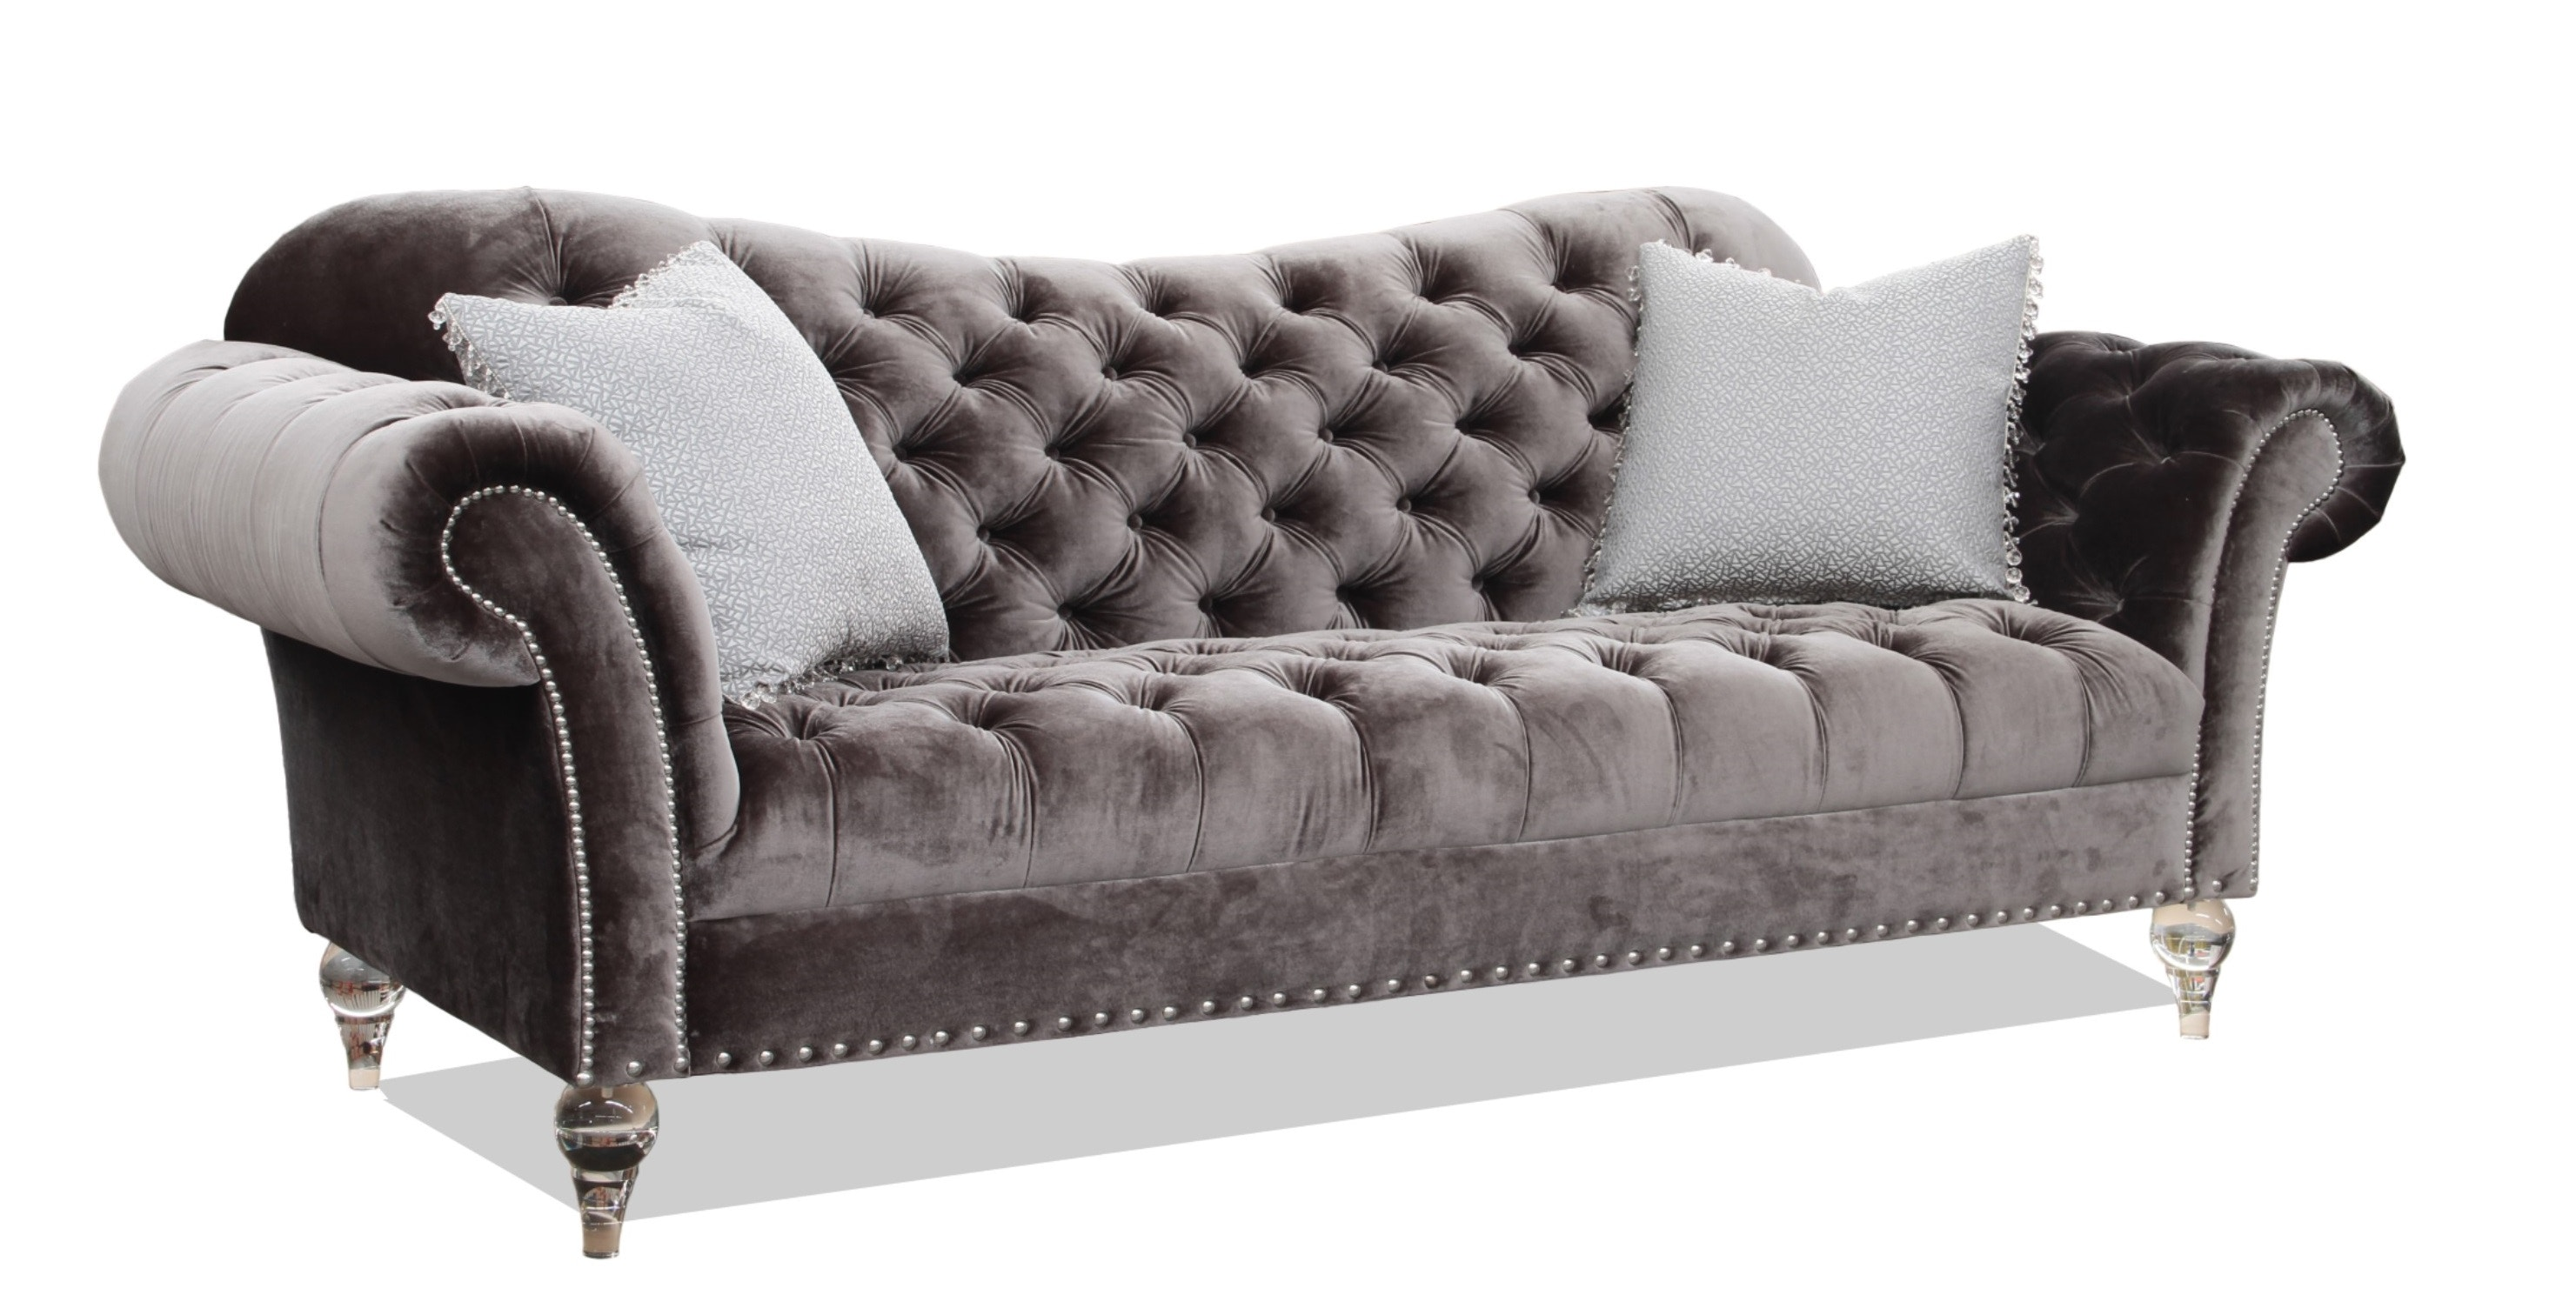 Hudson Living Room Vanna Sofa 419630 At Finesse Furniture U0026 Interiors